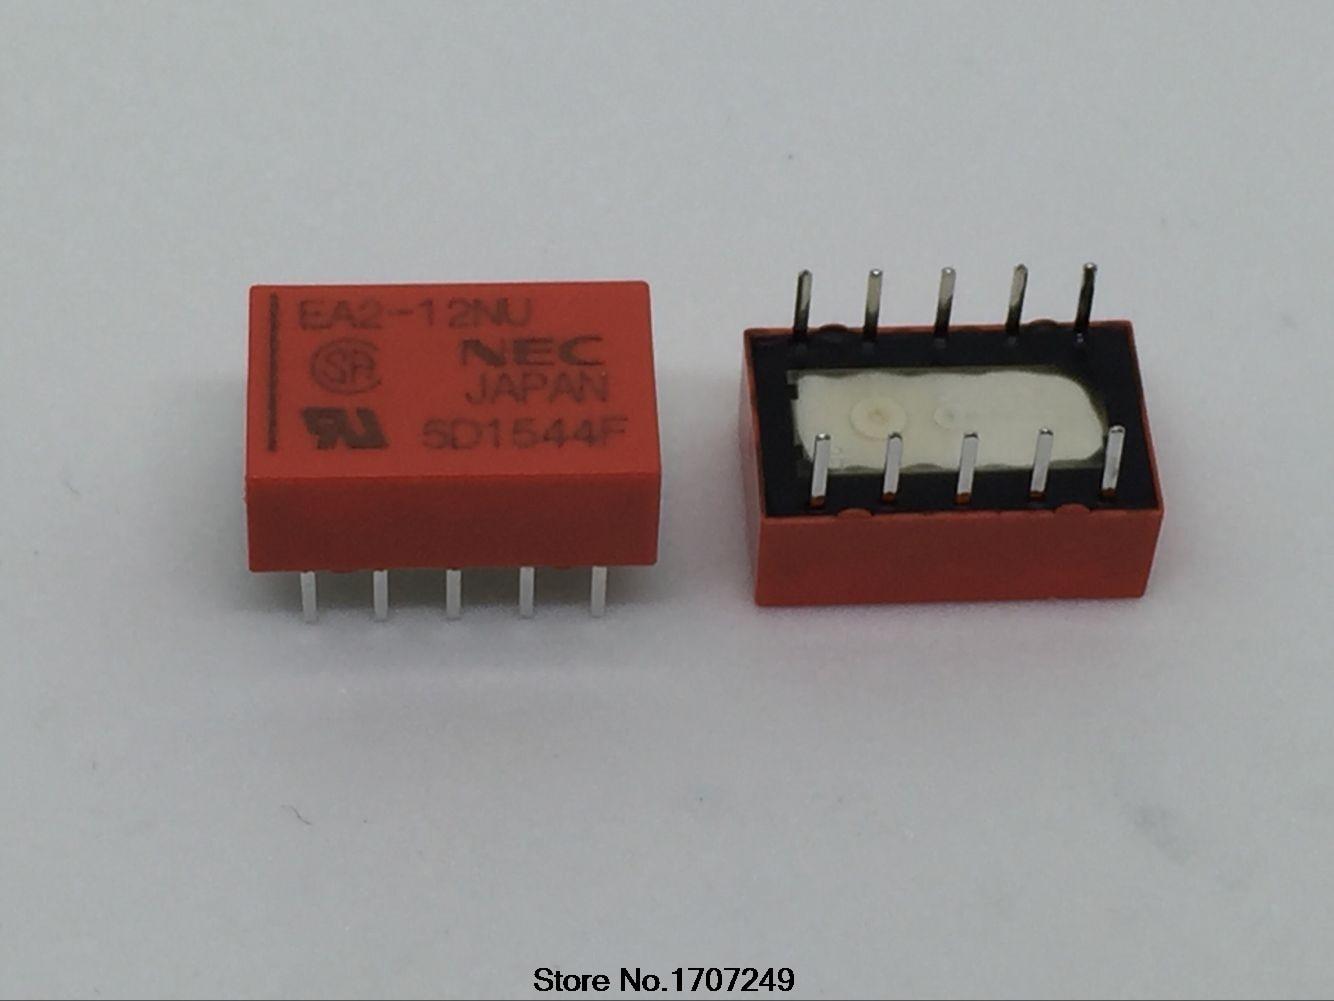 Free Shipping 100pcs lot EA2 12 EA2 12NU 10 pin 1A can replace Matsushita TQ2 12V